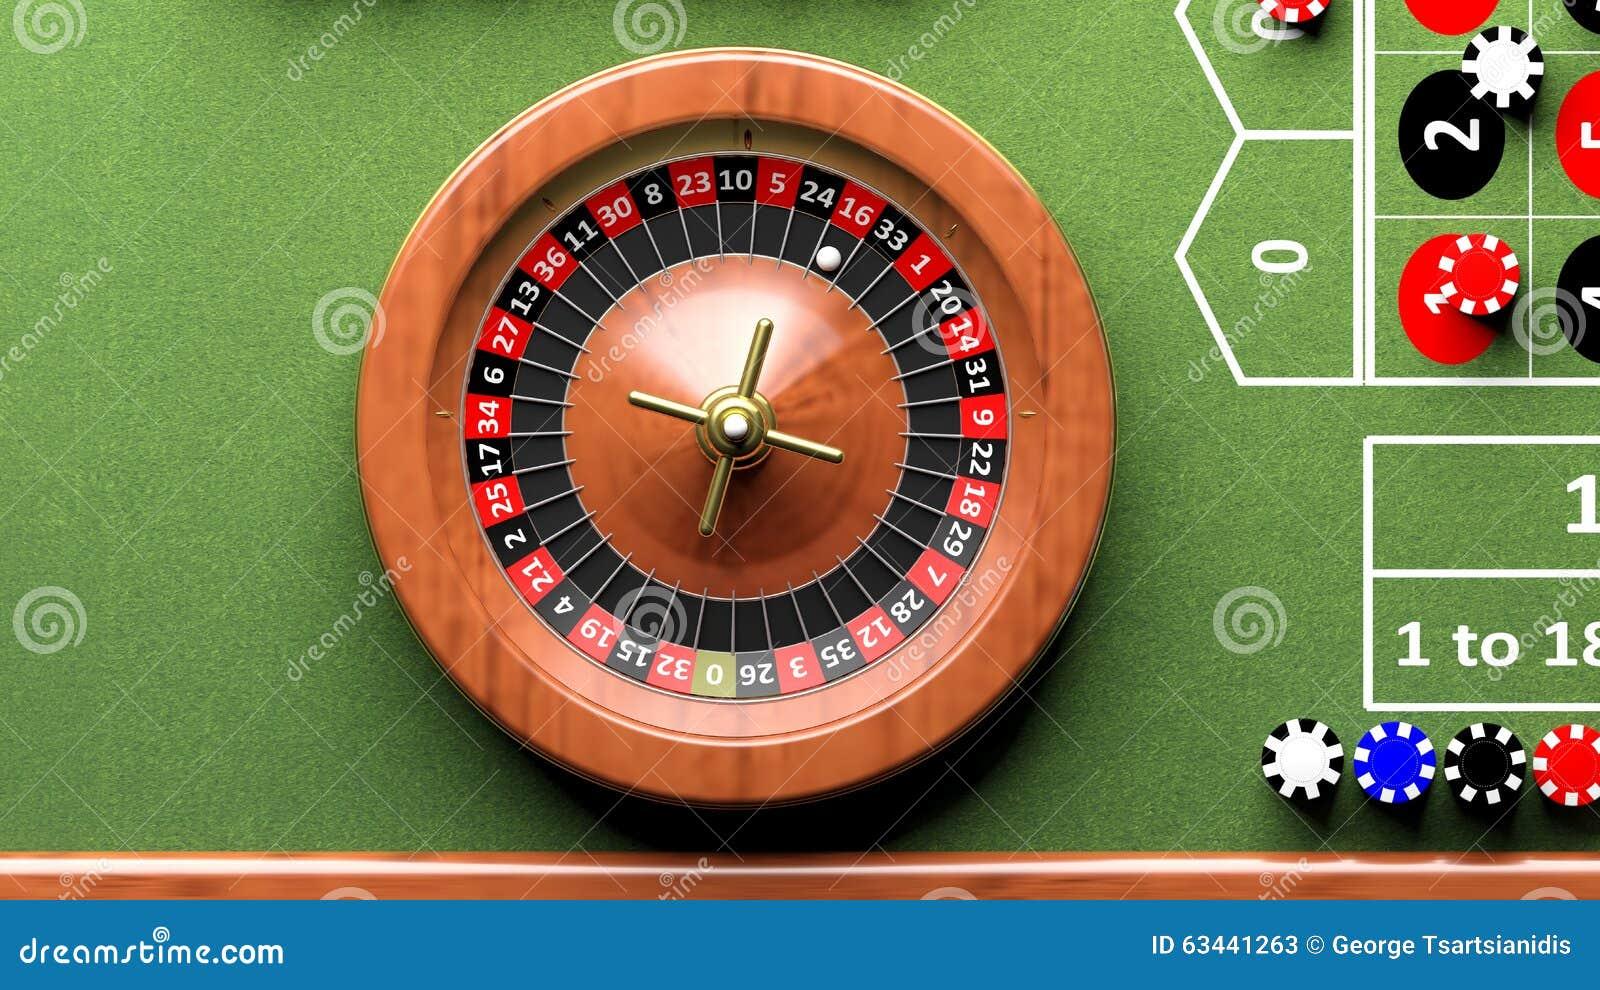 Gambling three no-trump bridge